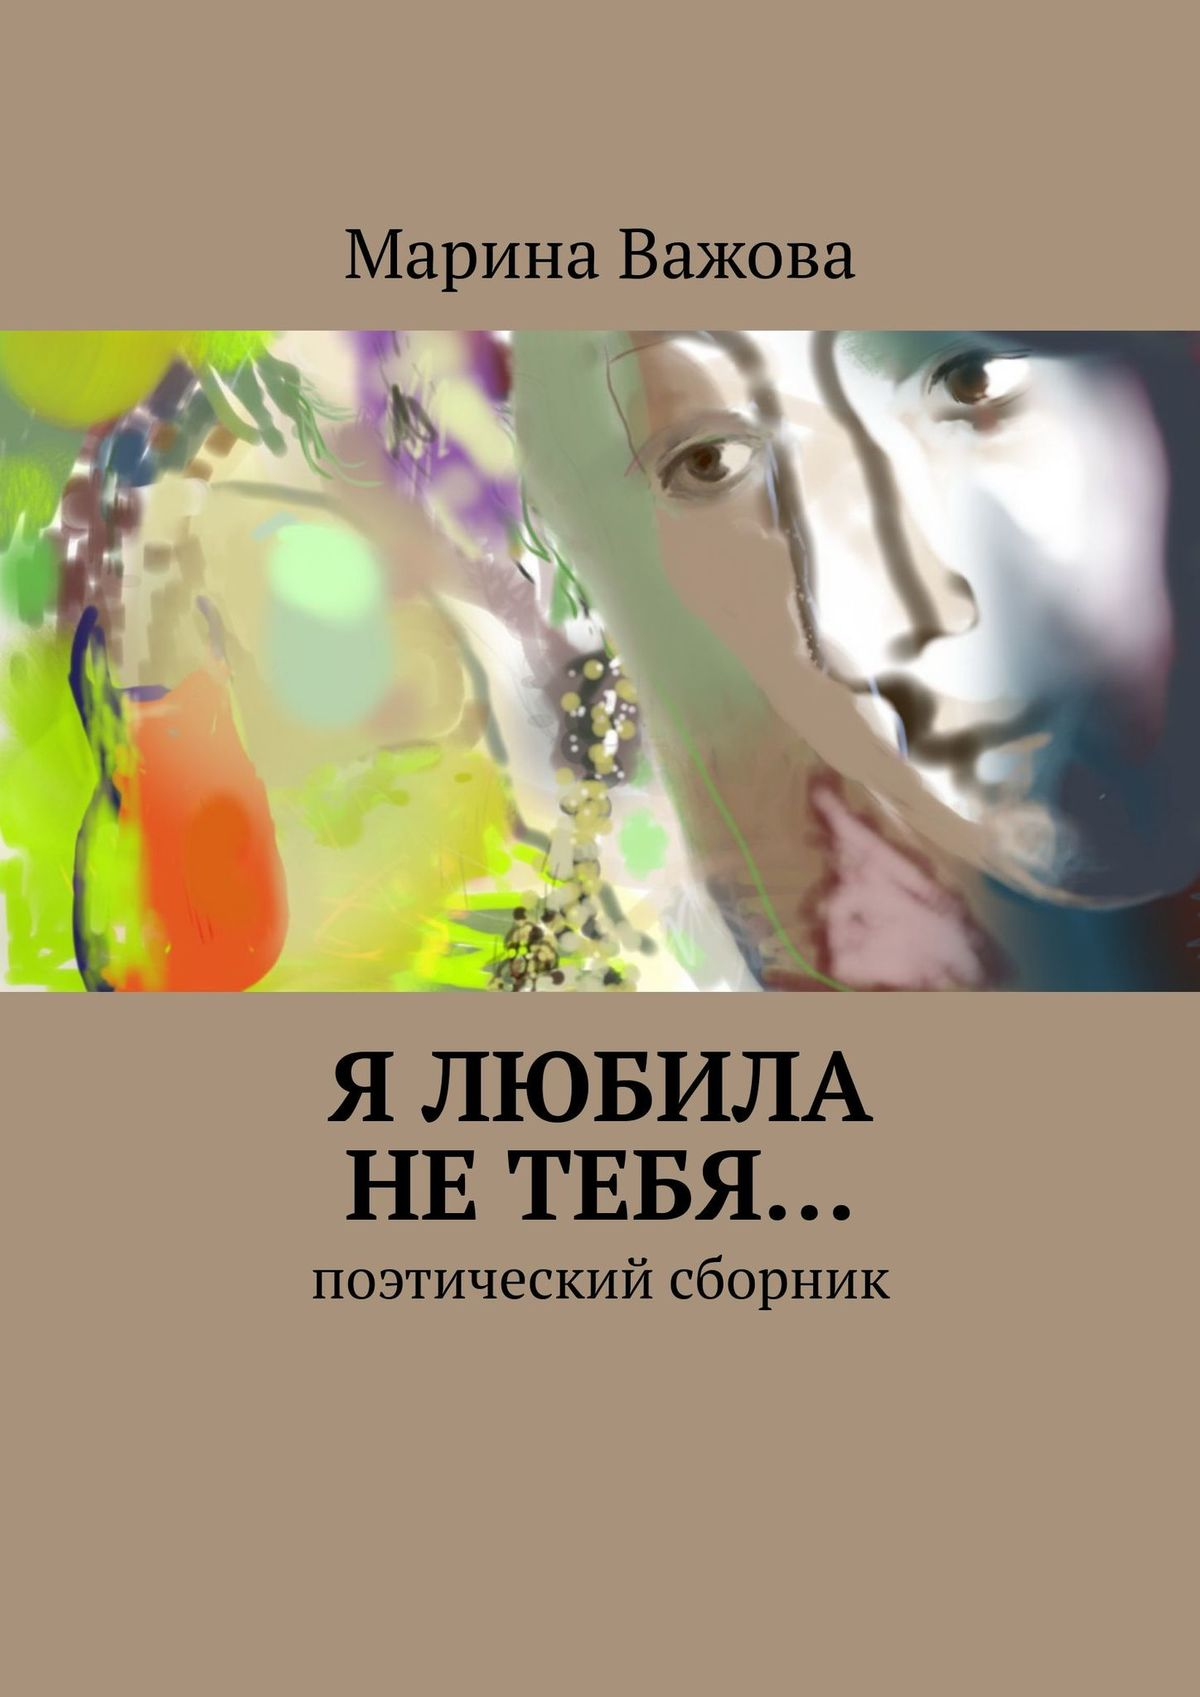 Марина Важова Я любила не тебя… Сборник стихов